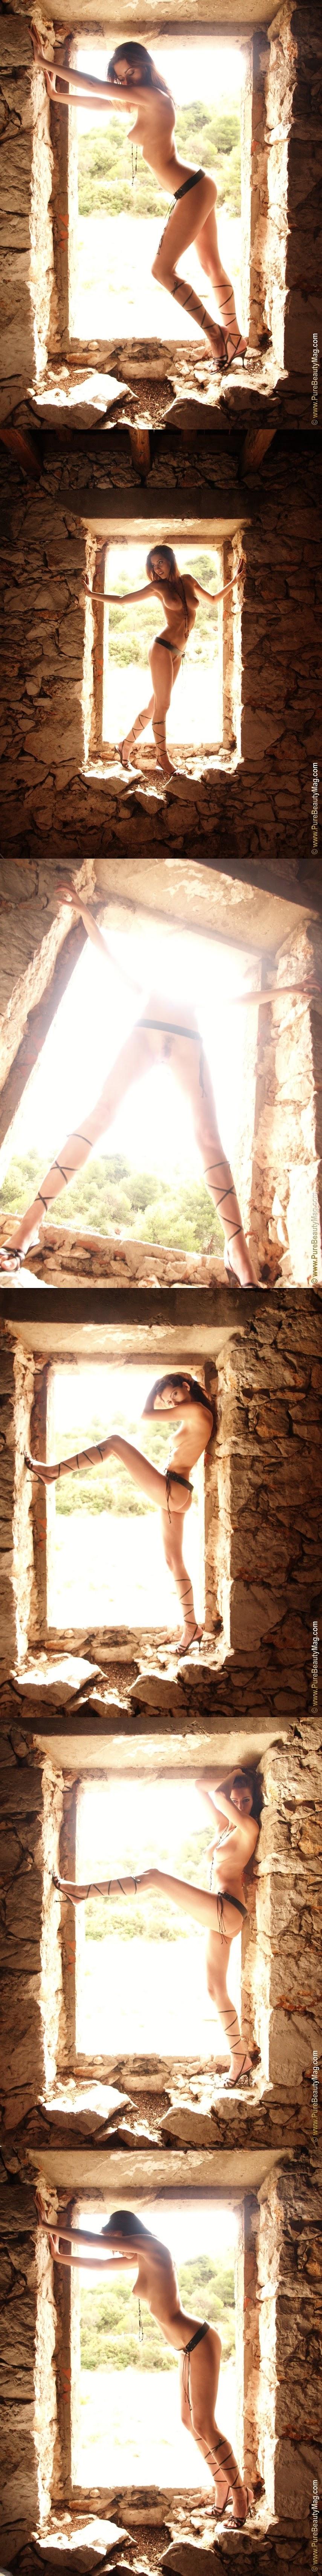 PureBeautyMag PBM  - 2006-01-24 - #s173732 - Katy - Lullabye - 3008px